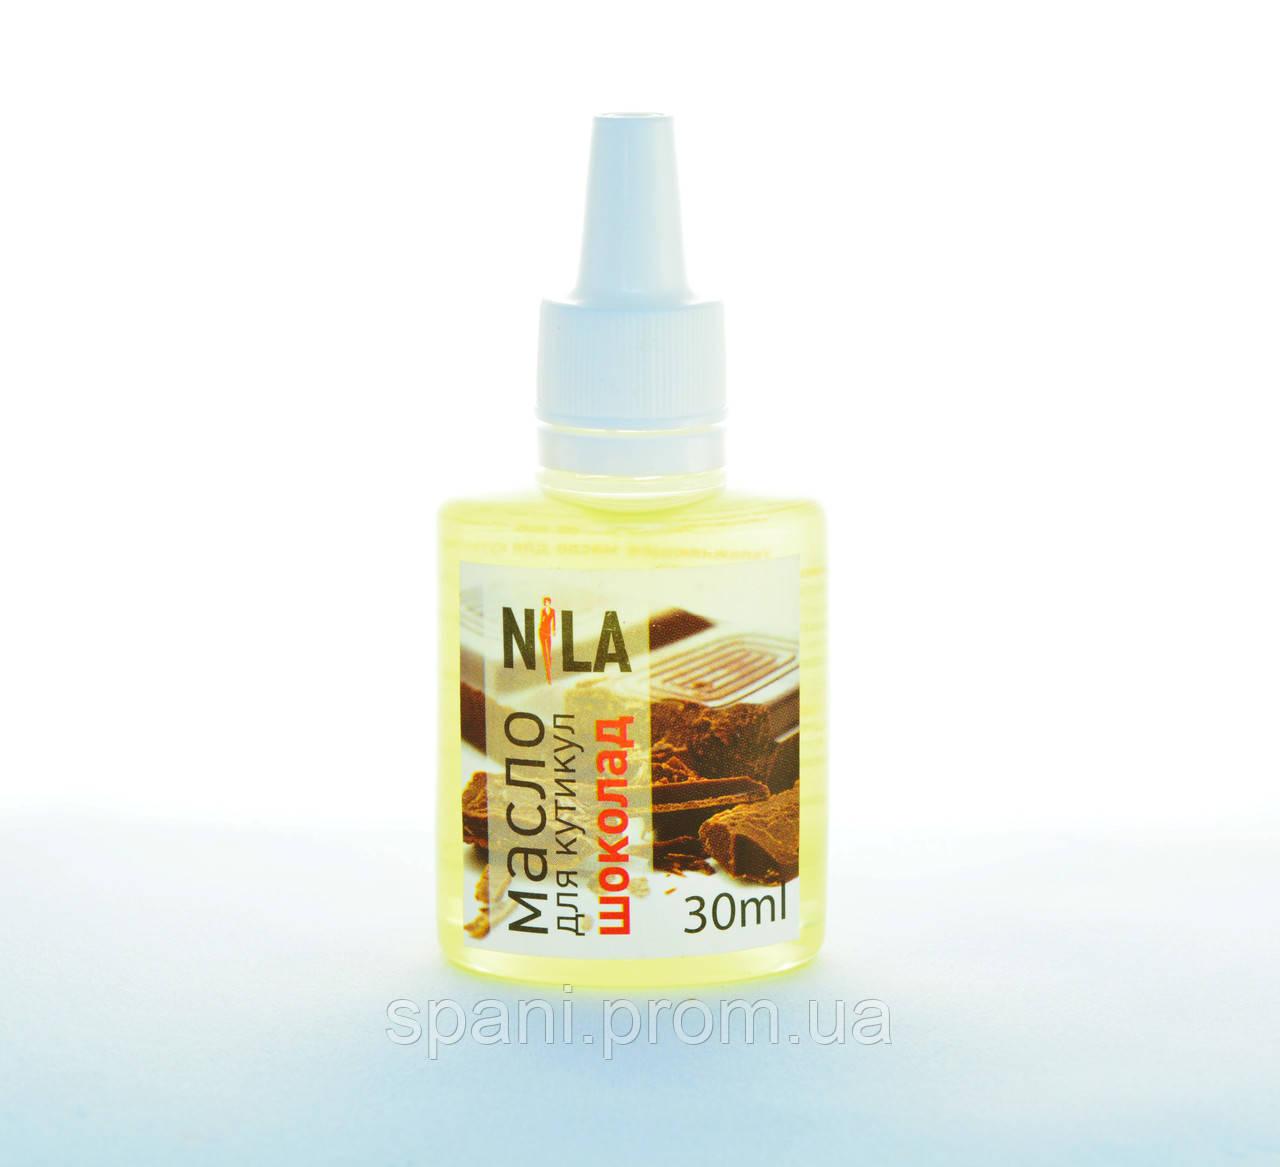 Nila Cuticle Oil Масло для кутикул Шоколад, 30 мл.